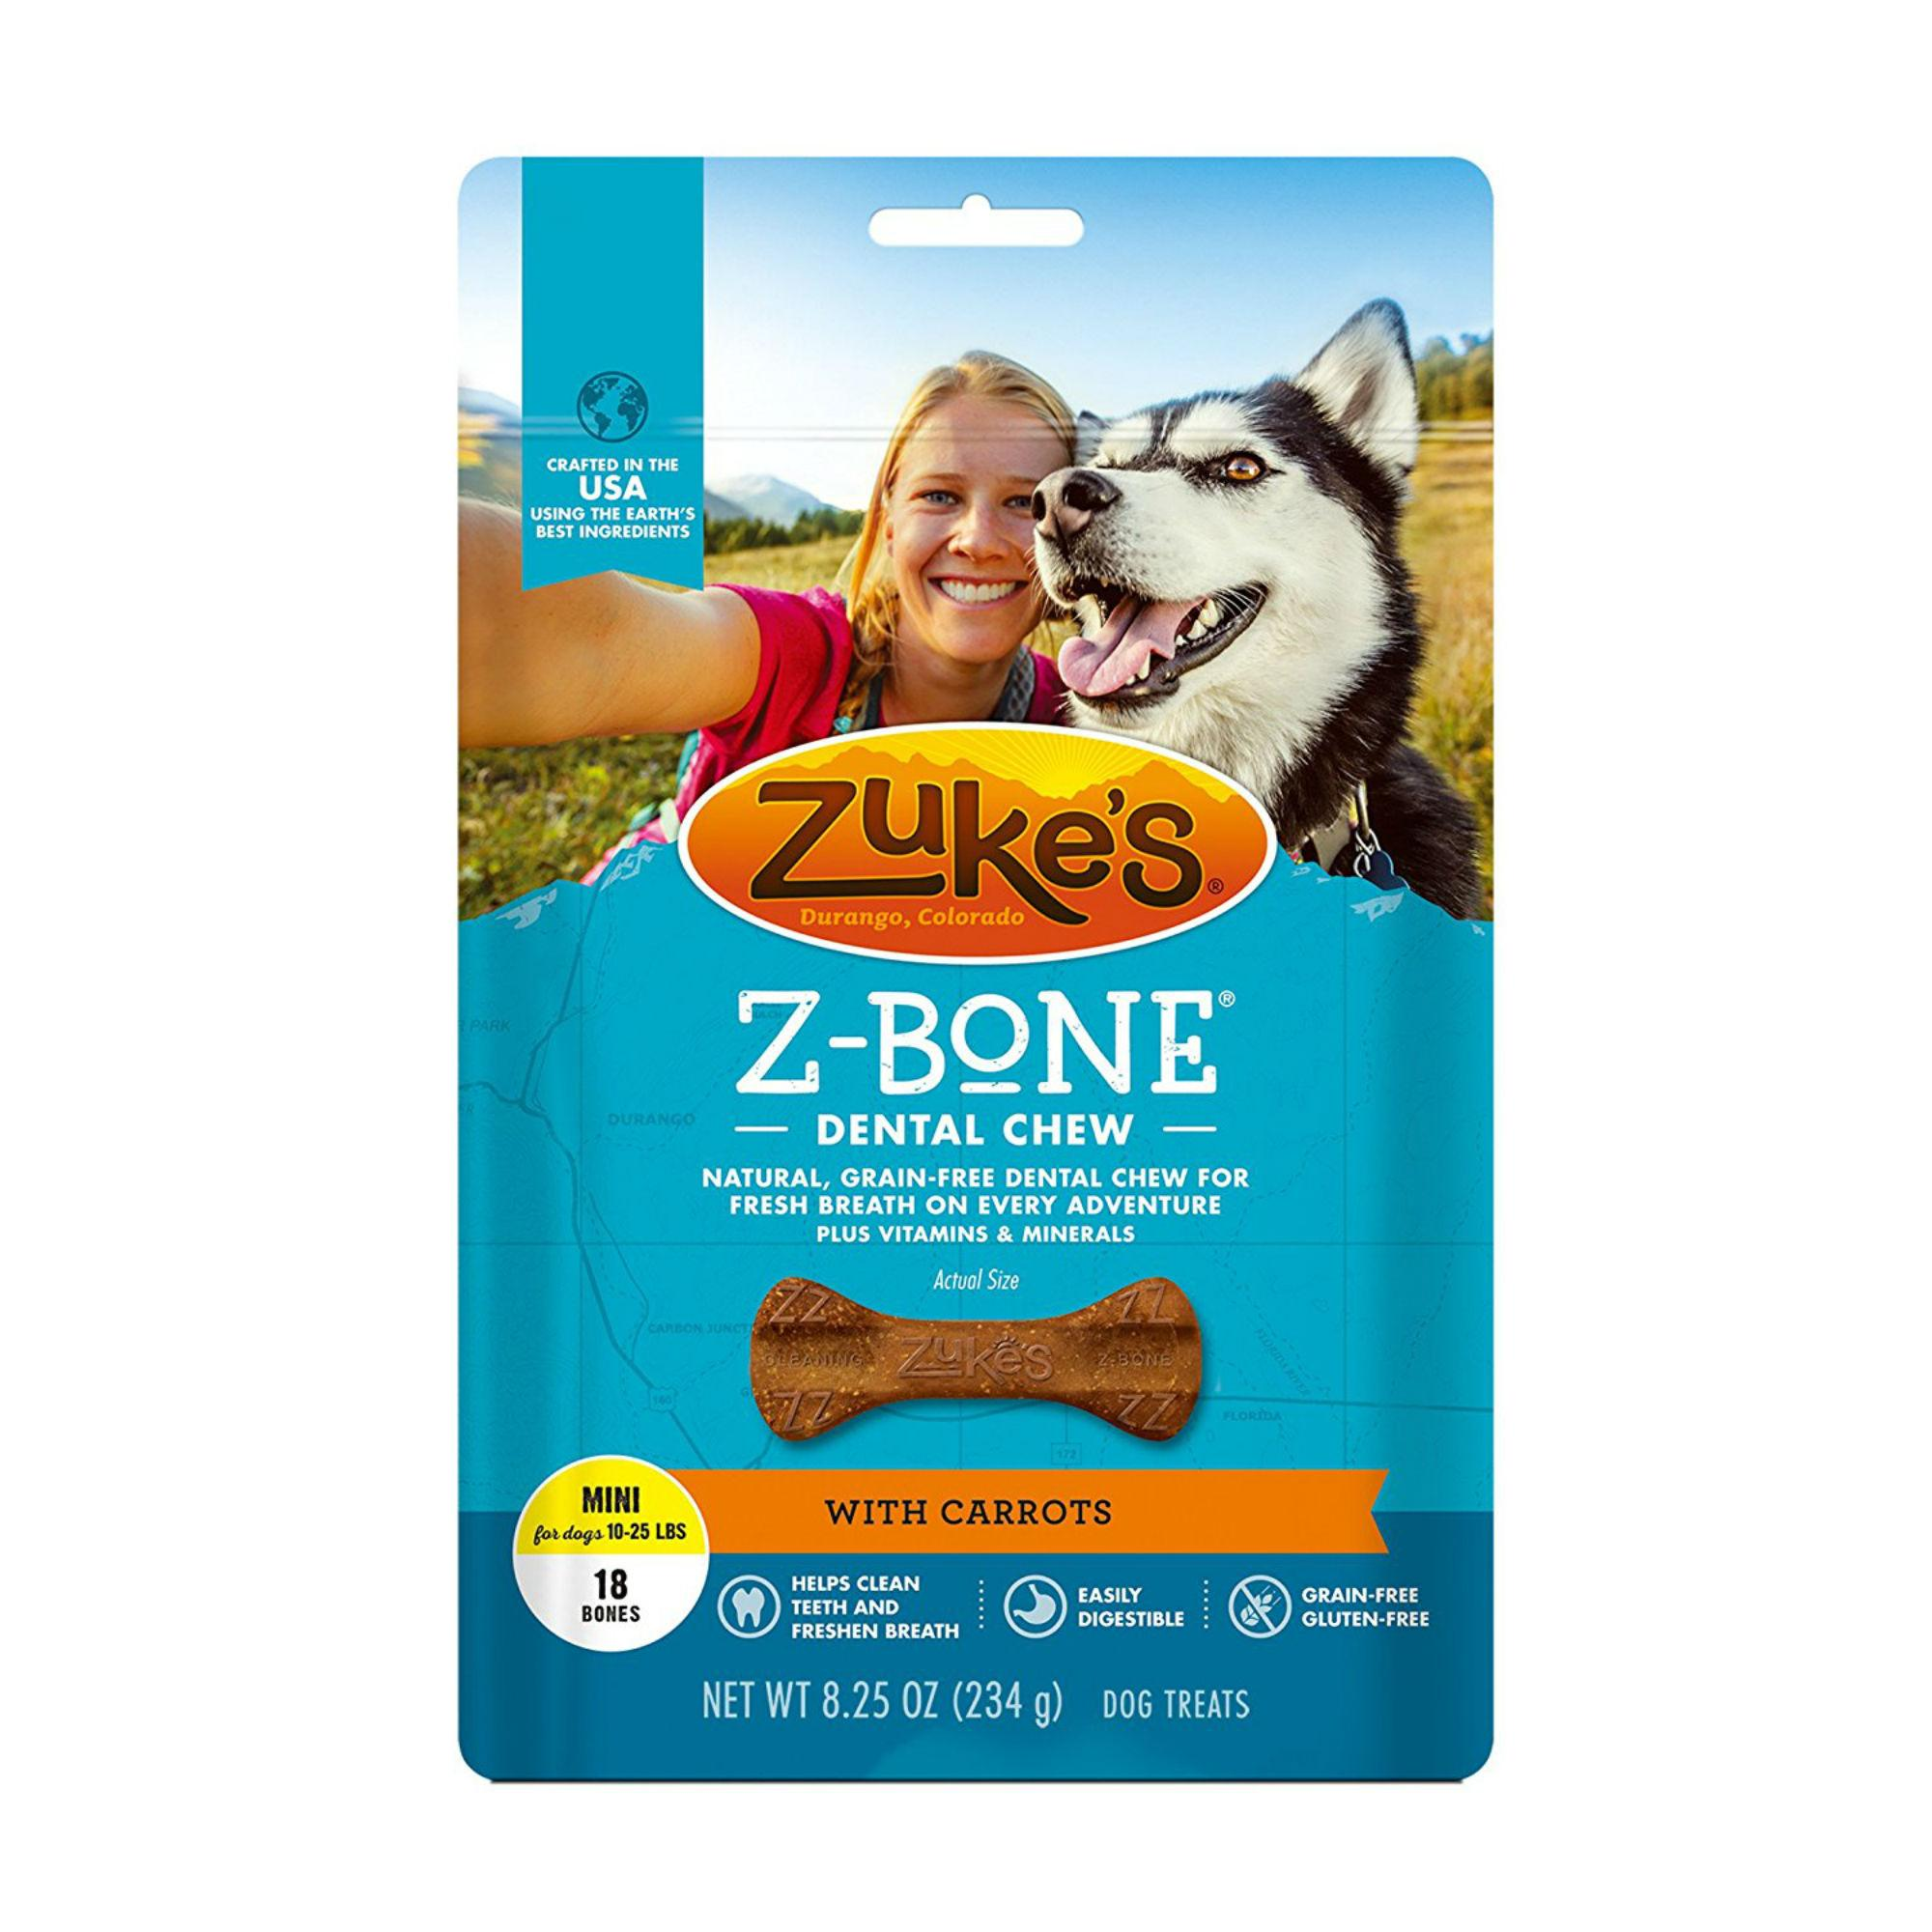 Zuke's Z-Bones Dental Dog Chews - Carrot